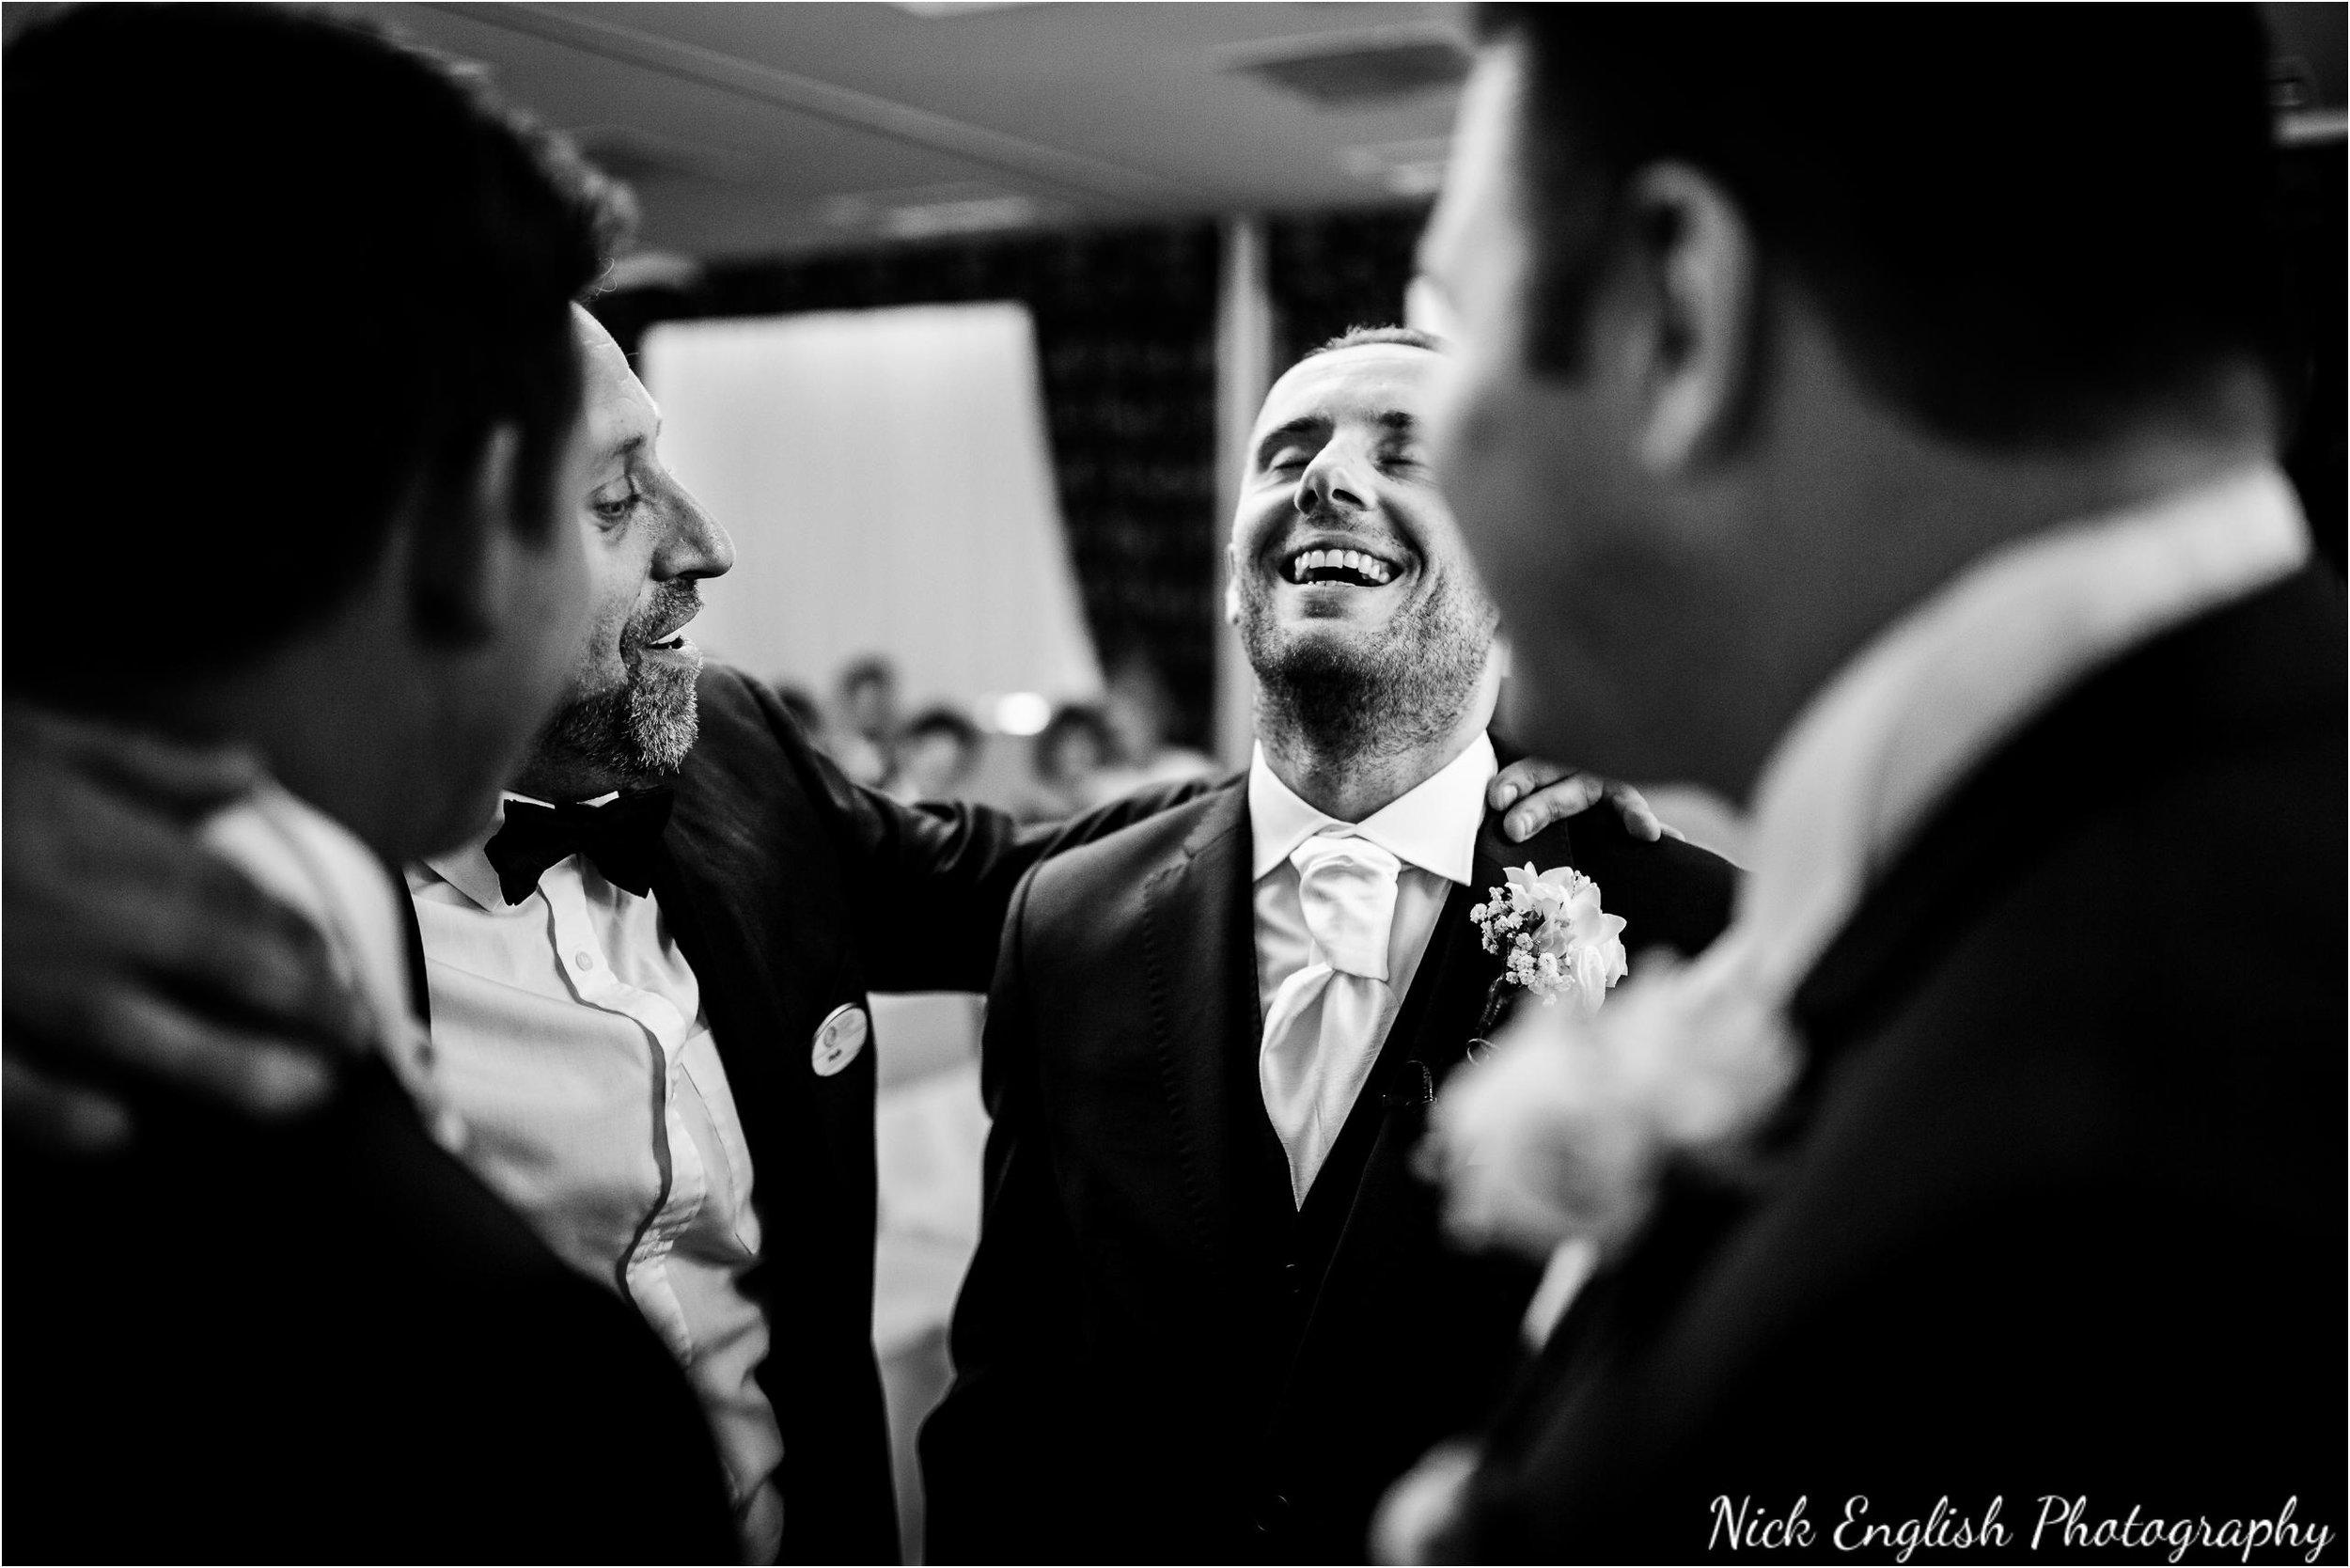 Emily David Wedding Photographs at Barton Grange Preston by Nick English Photography 54jpg.jpeg